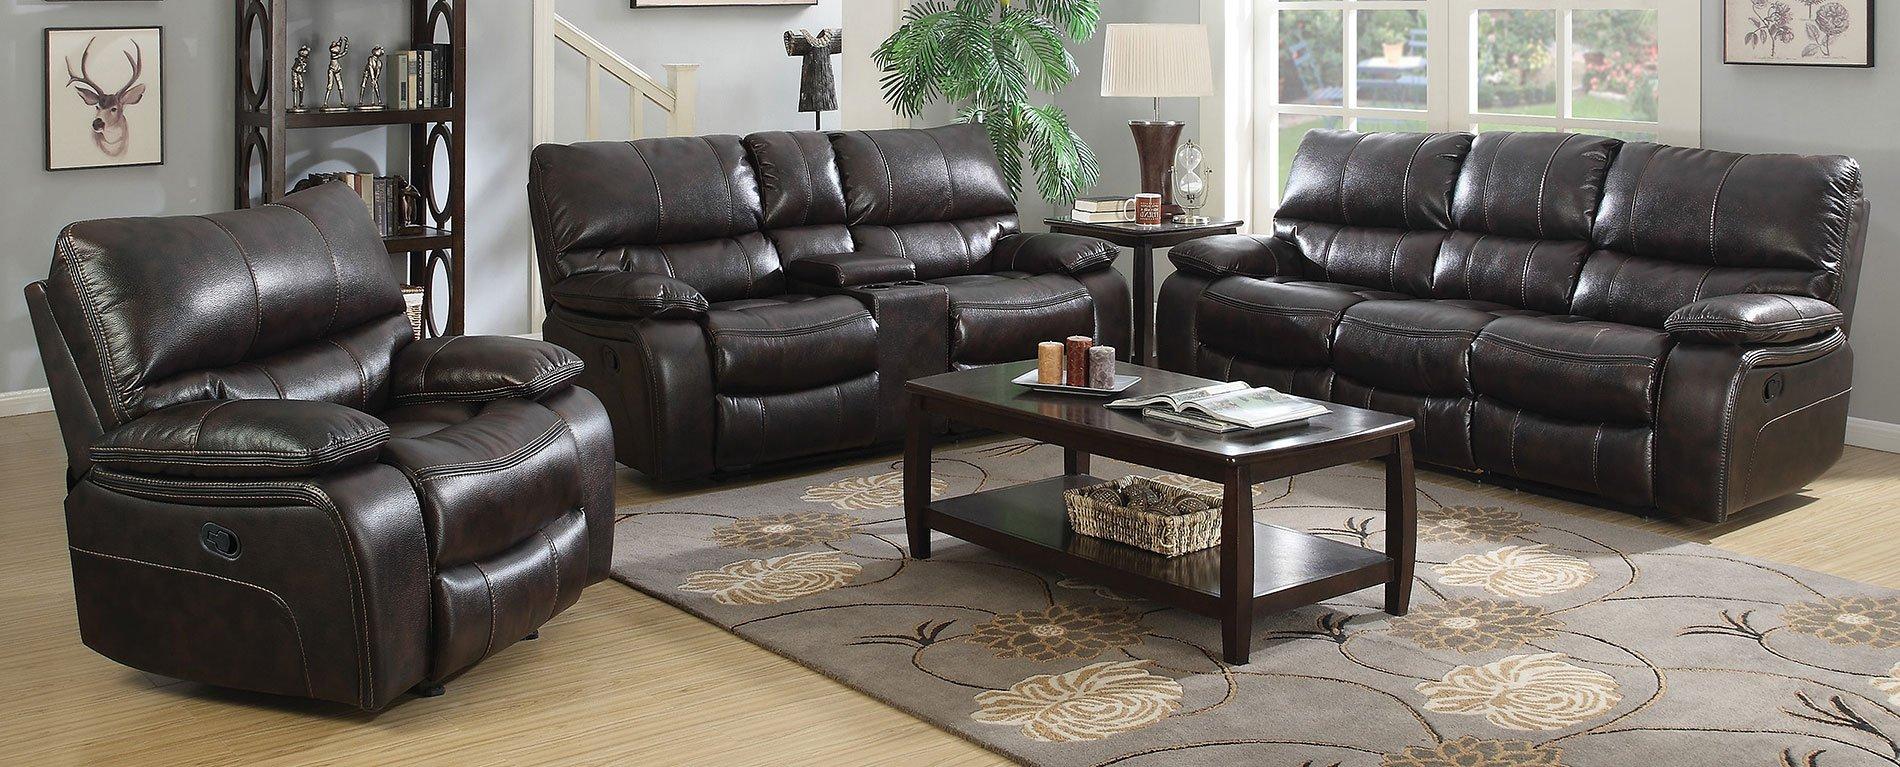 Willemse Reclining Living Room Set Living Room Sets Living Room Furniture Living Room